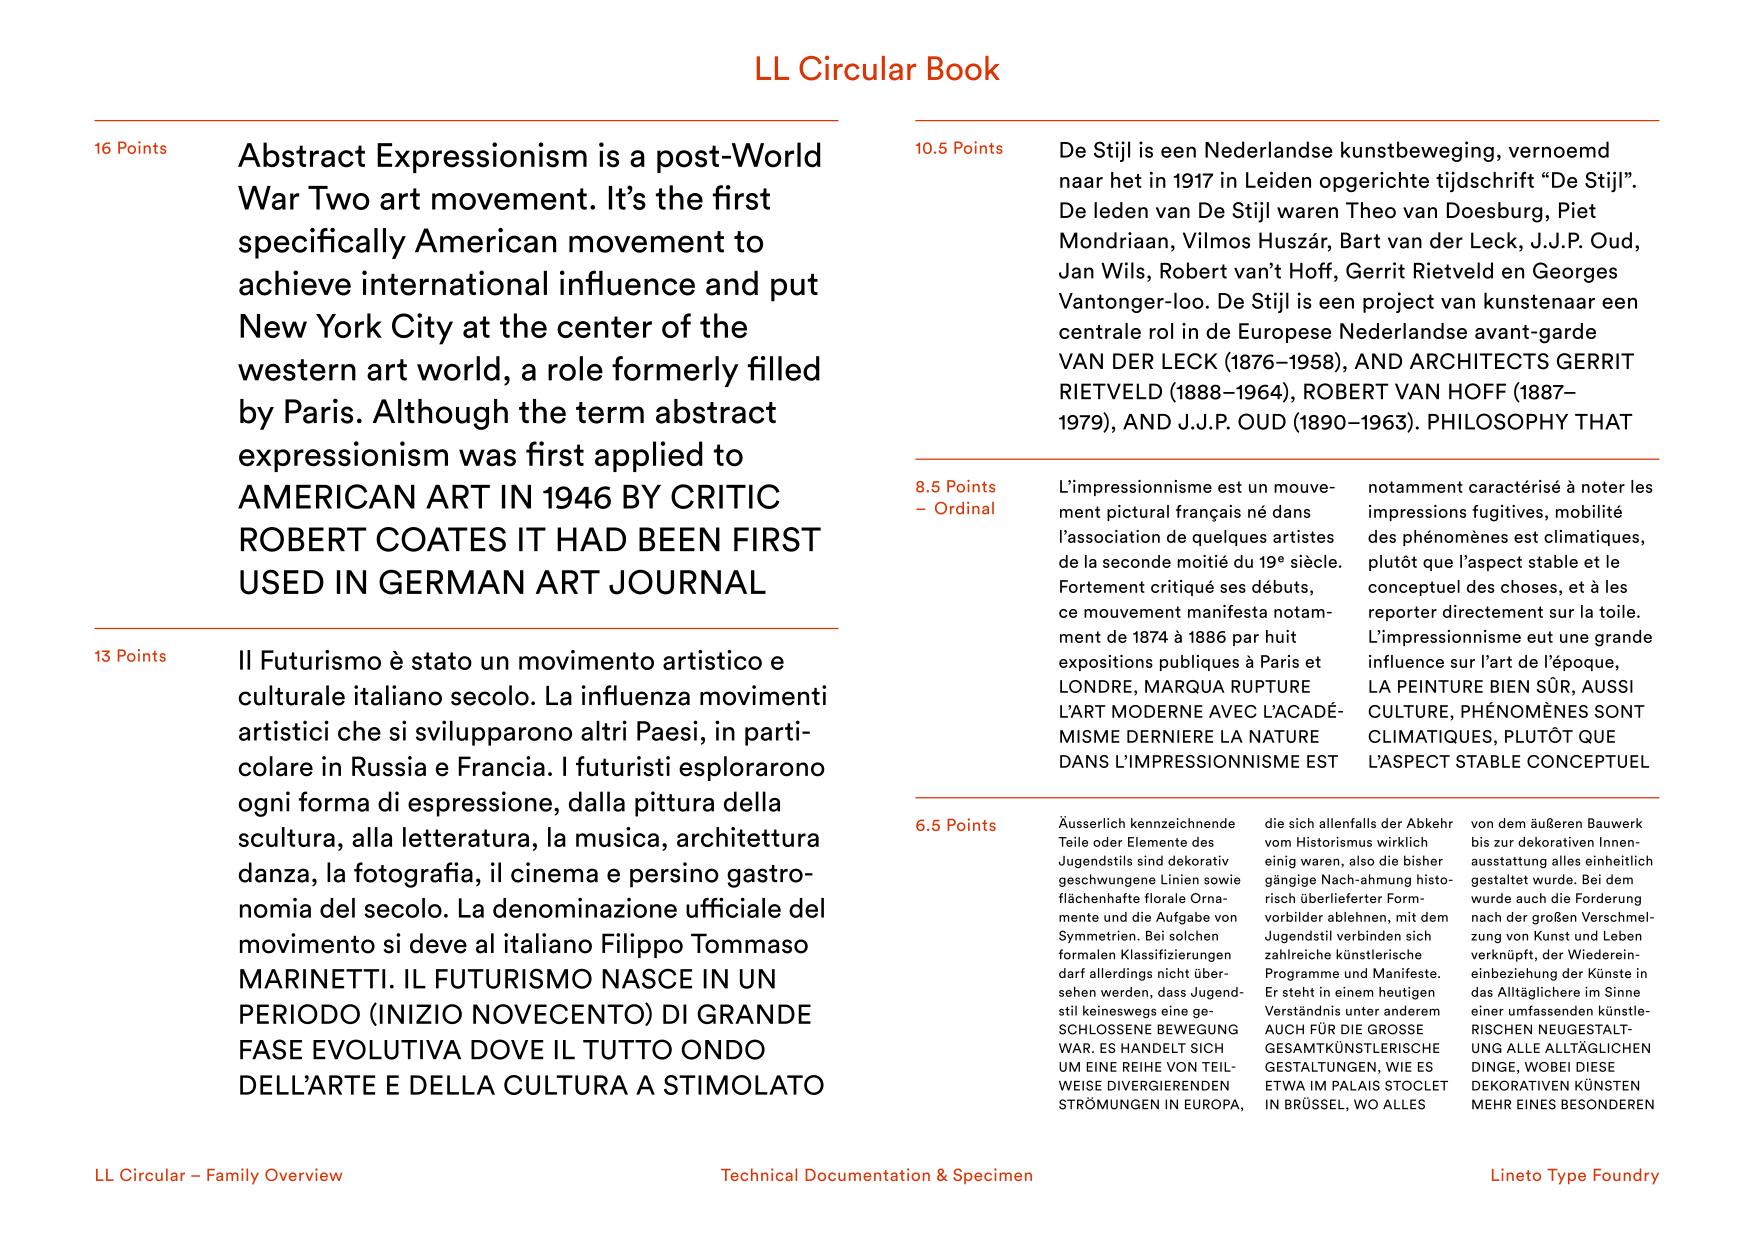 LL Circular – Typographica